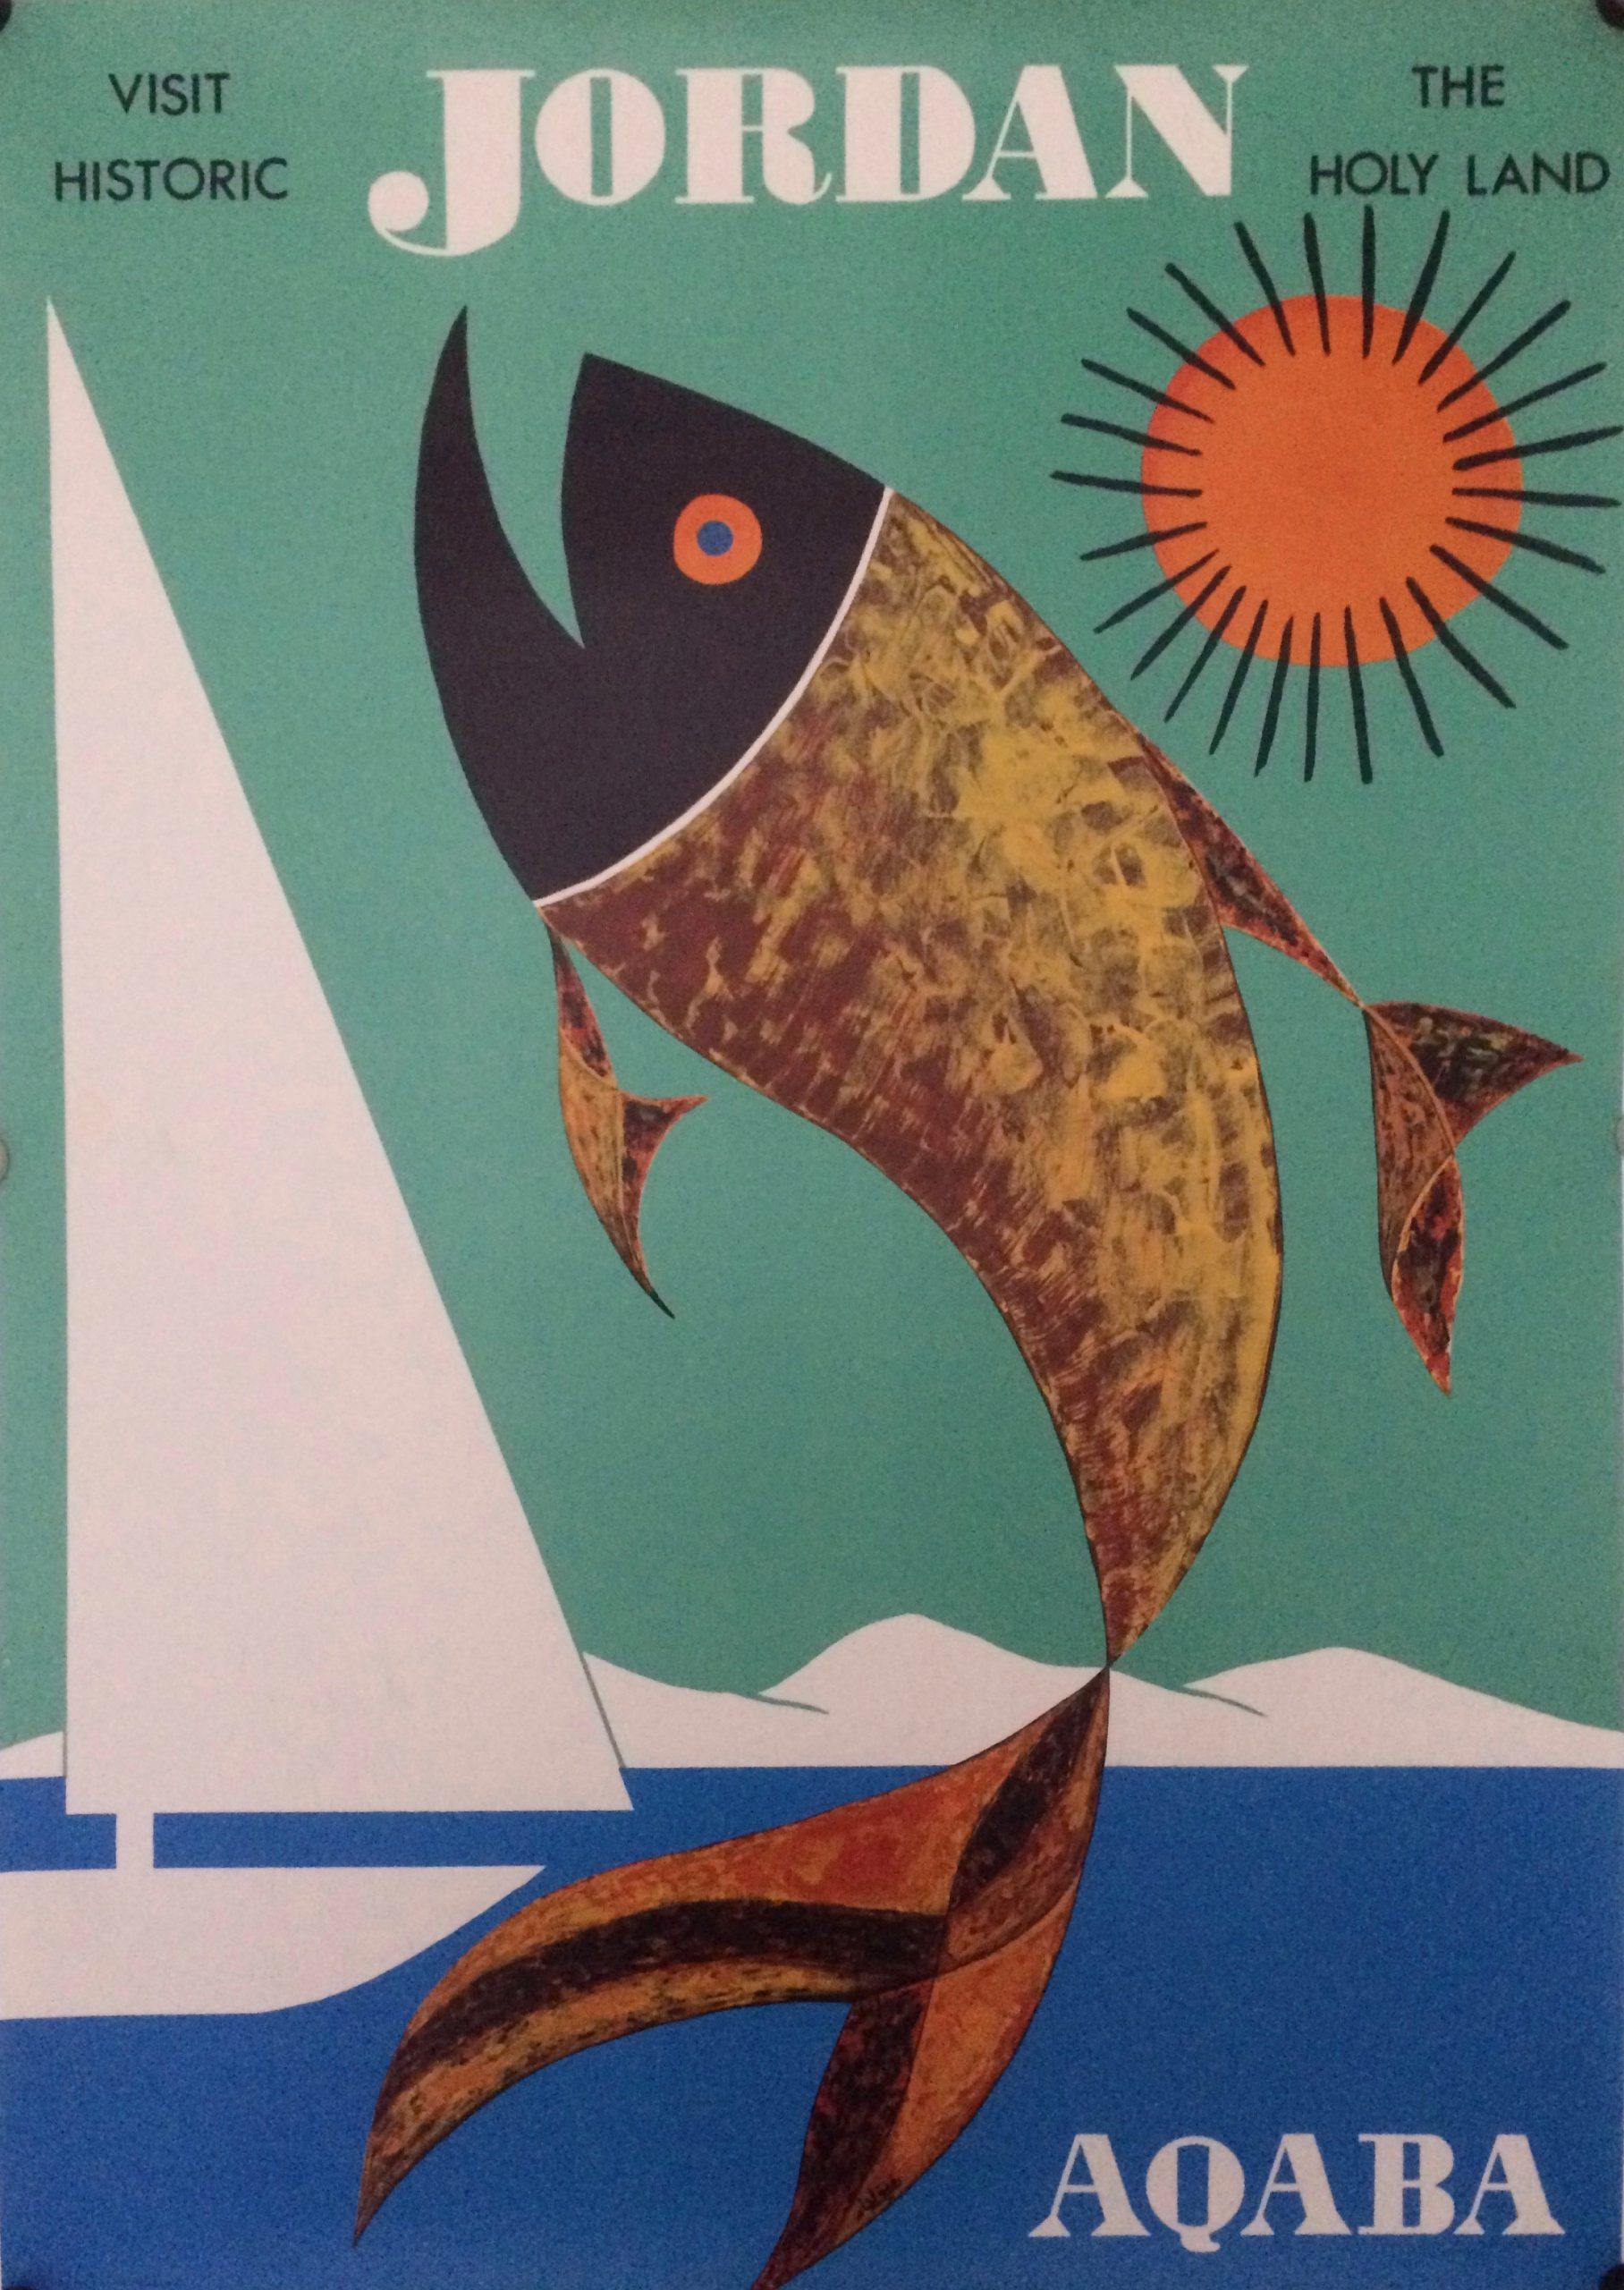 Travel poster for Aqaba Jordan